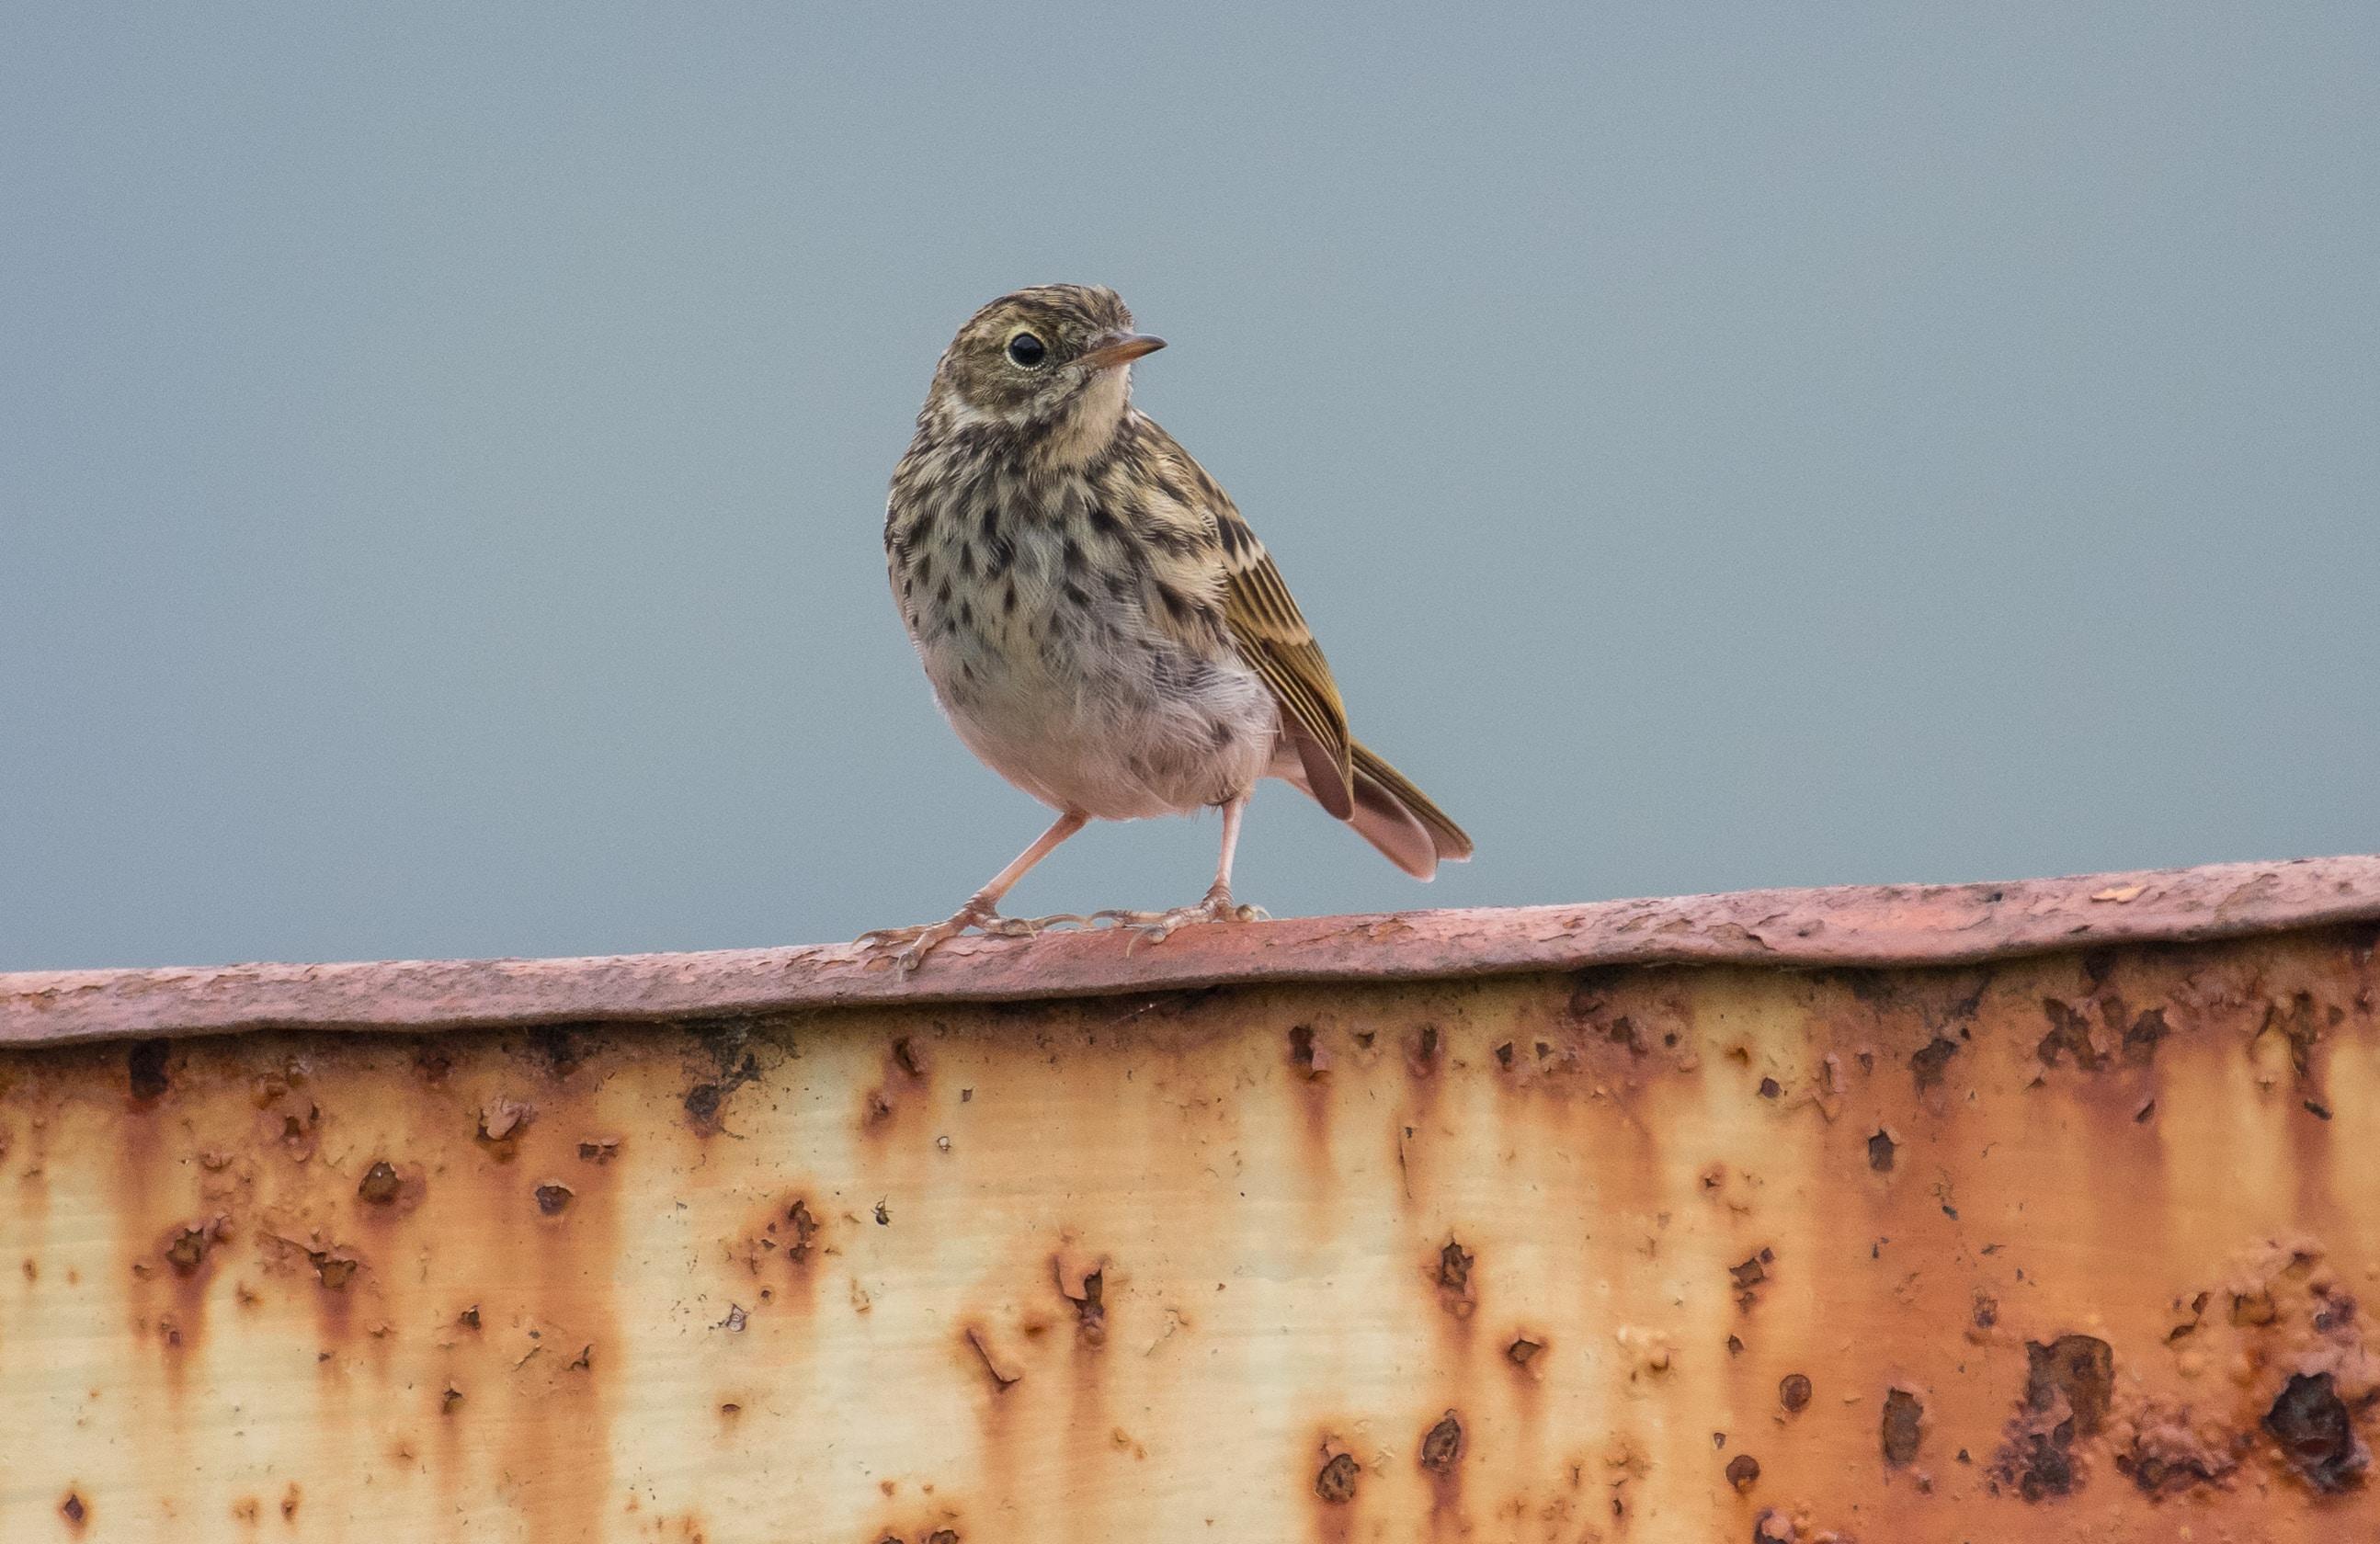 brown bird perching on brown metal